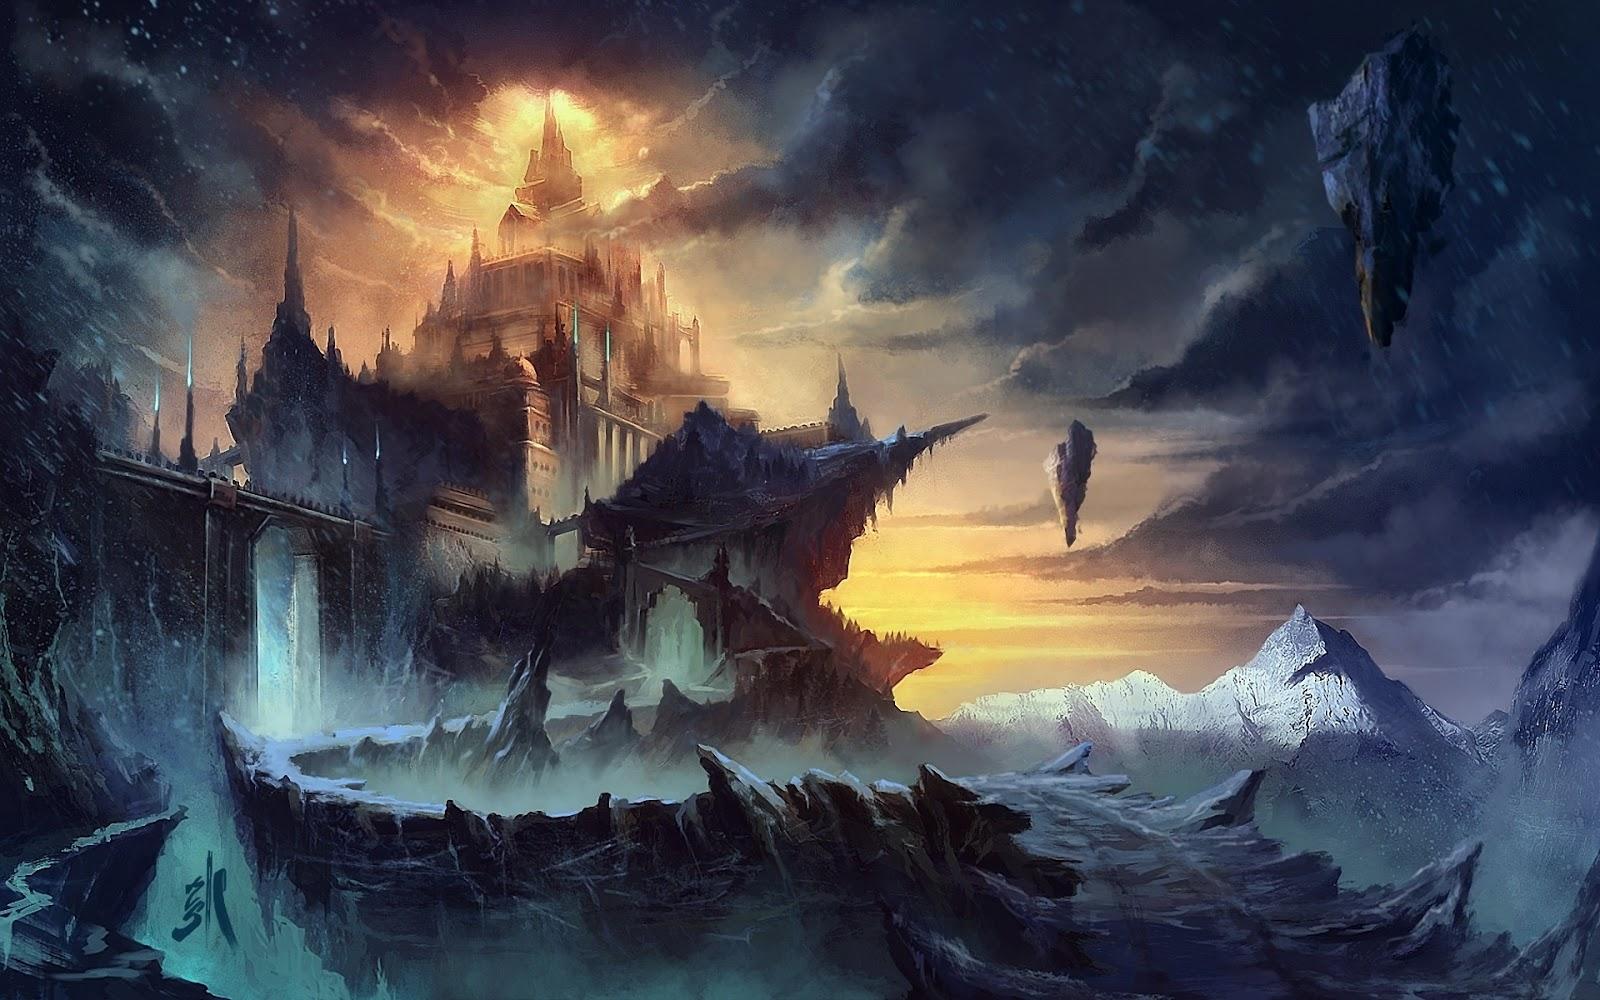 Imaginary Fantasy Castle HD Wallpaper